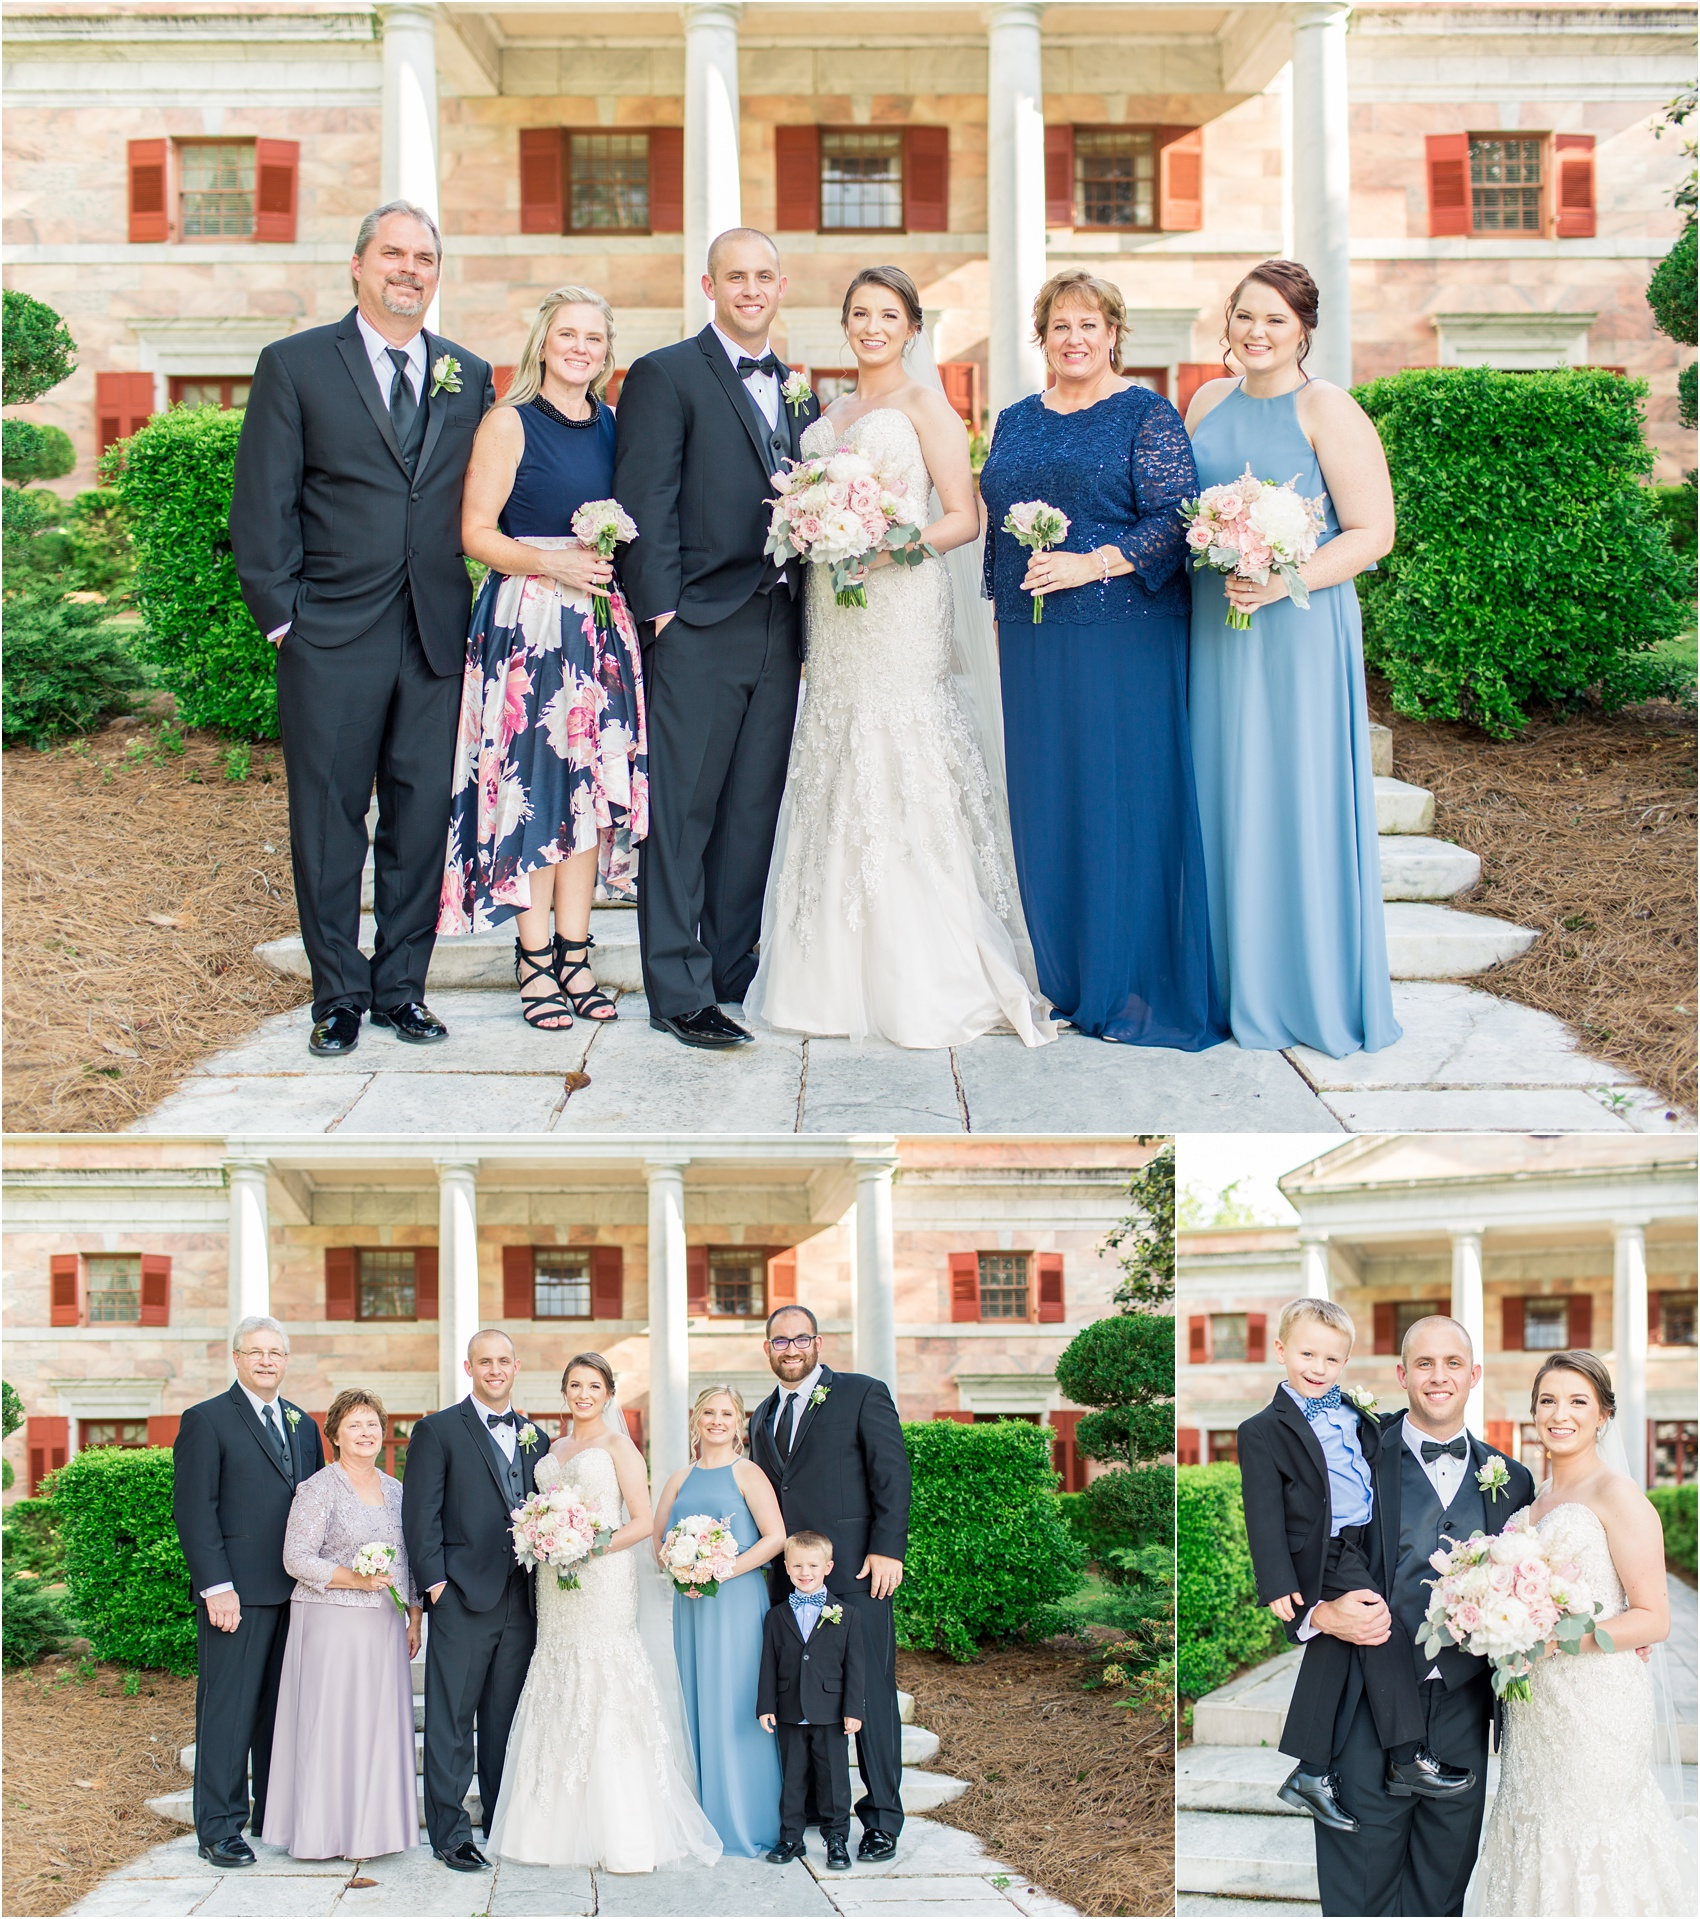 Savannah Eve Photography- Nutt Wedding- Blog-86.jpg